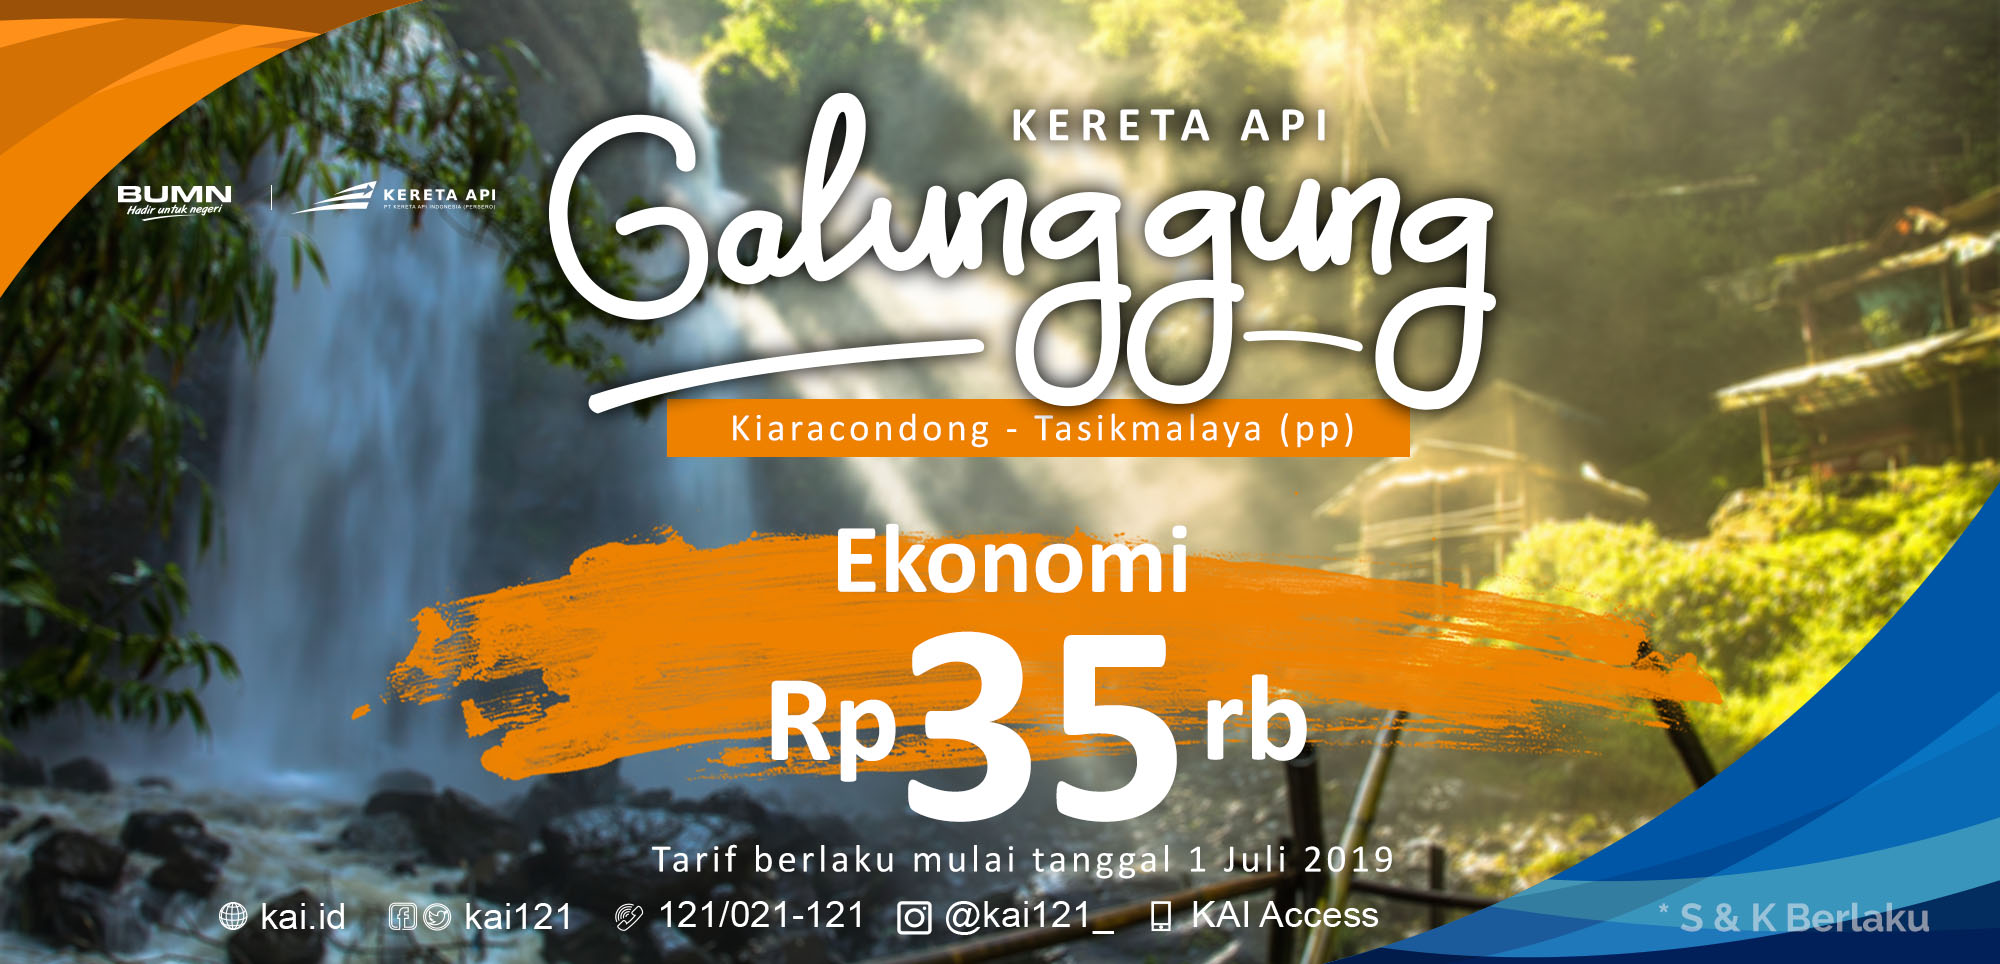 KA Galunggung mulai harga Rp 35ribu